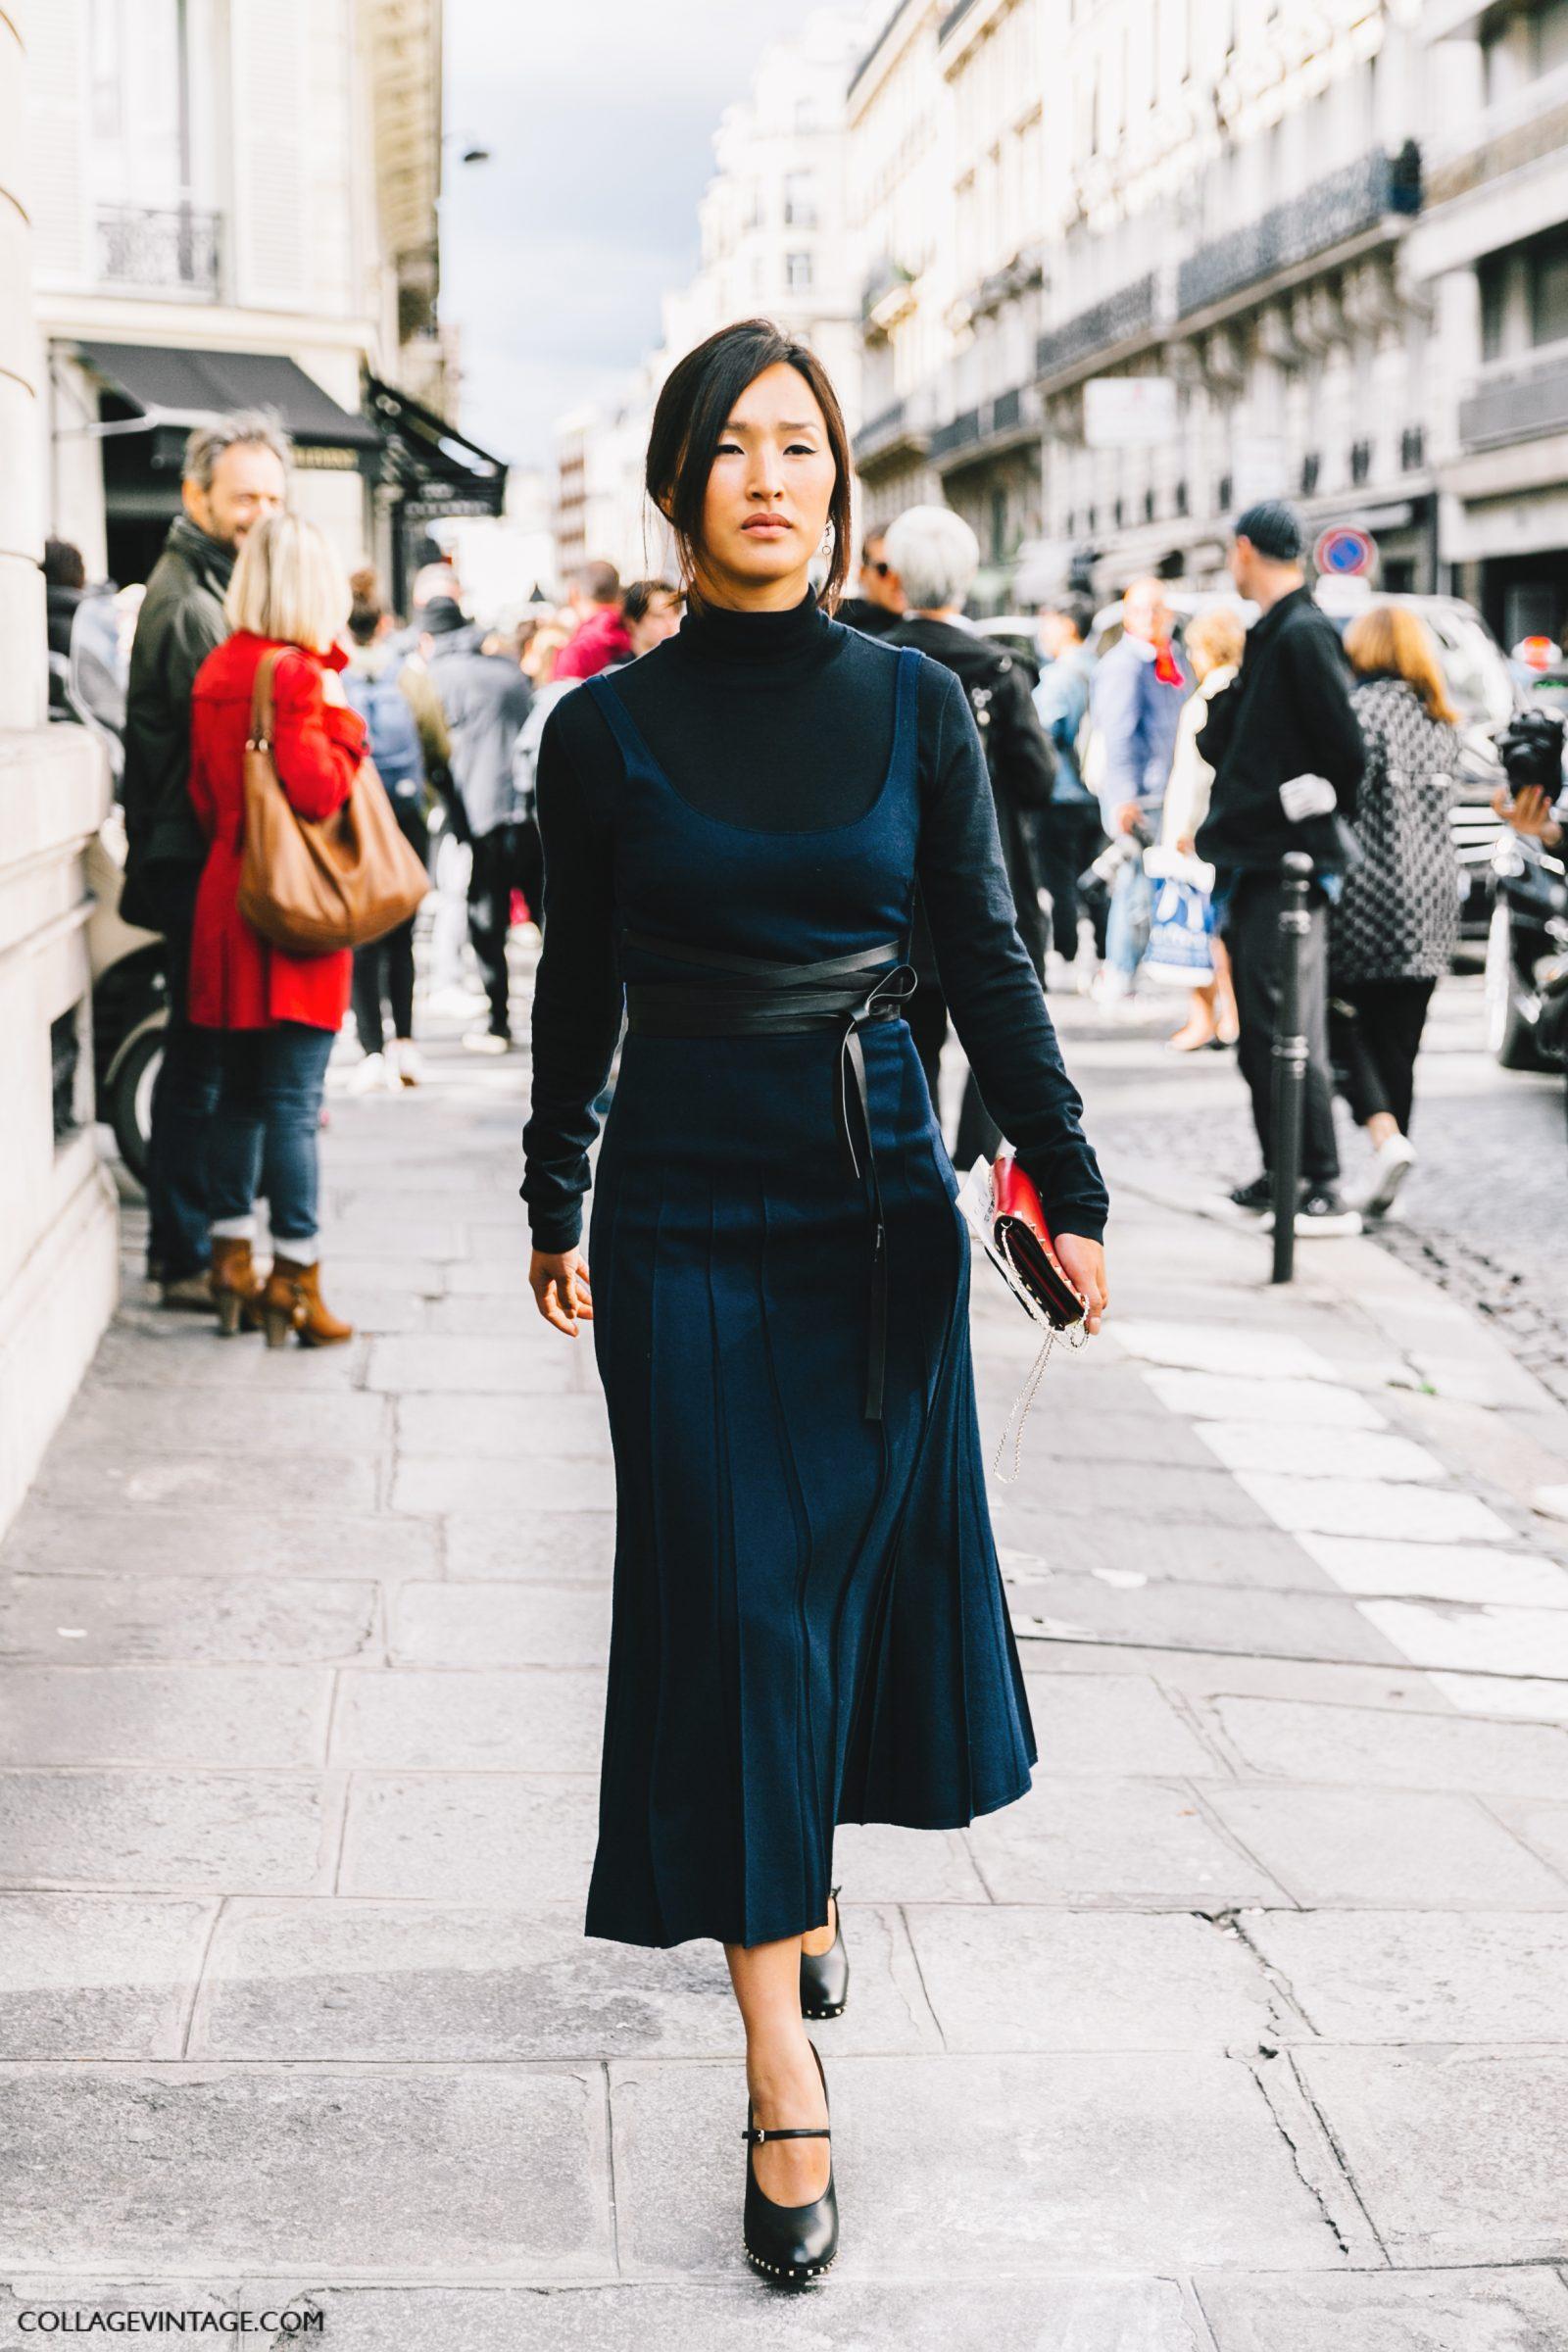 pfw-paris_fashion_week_ss17-street_style-outfits-collage_vintage-valentino-balenciaga-celine-129